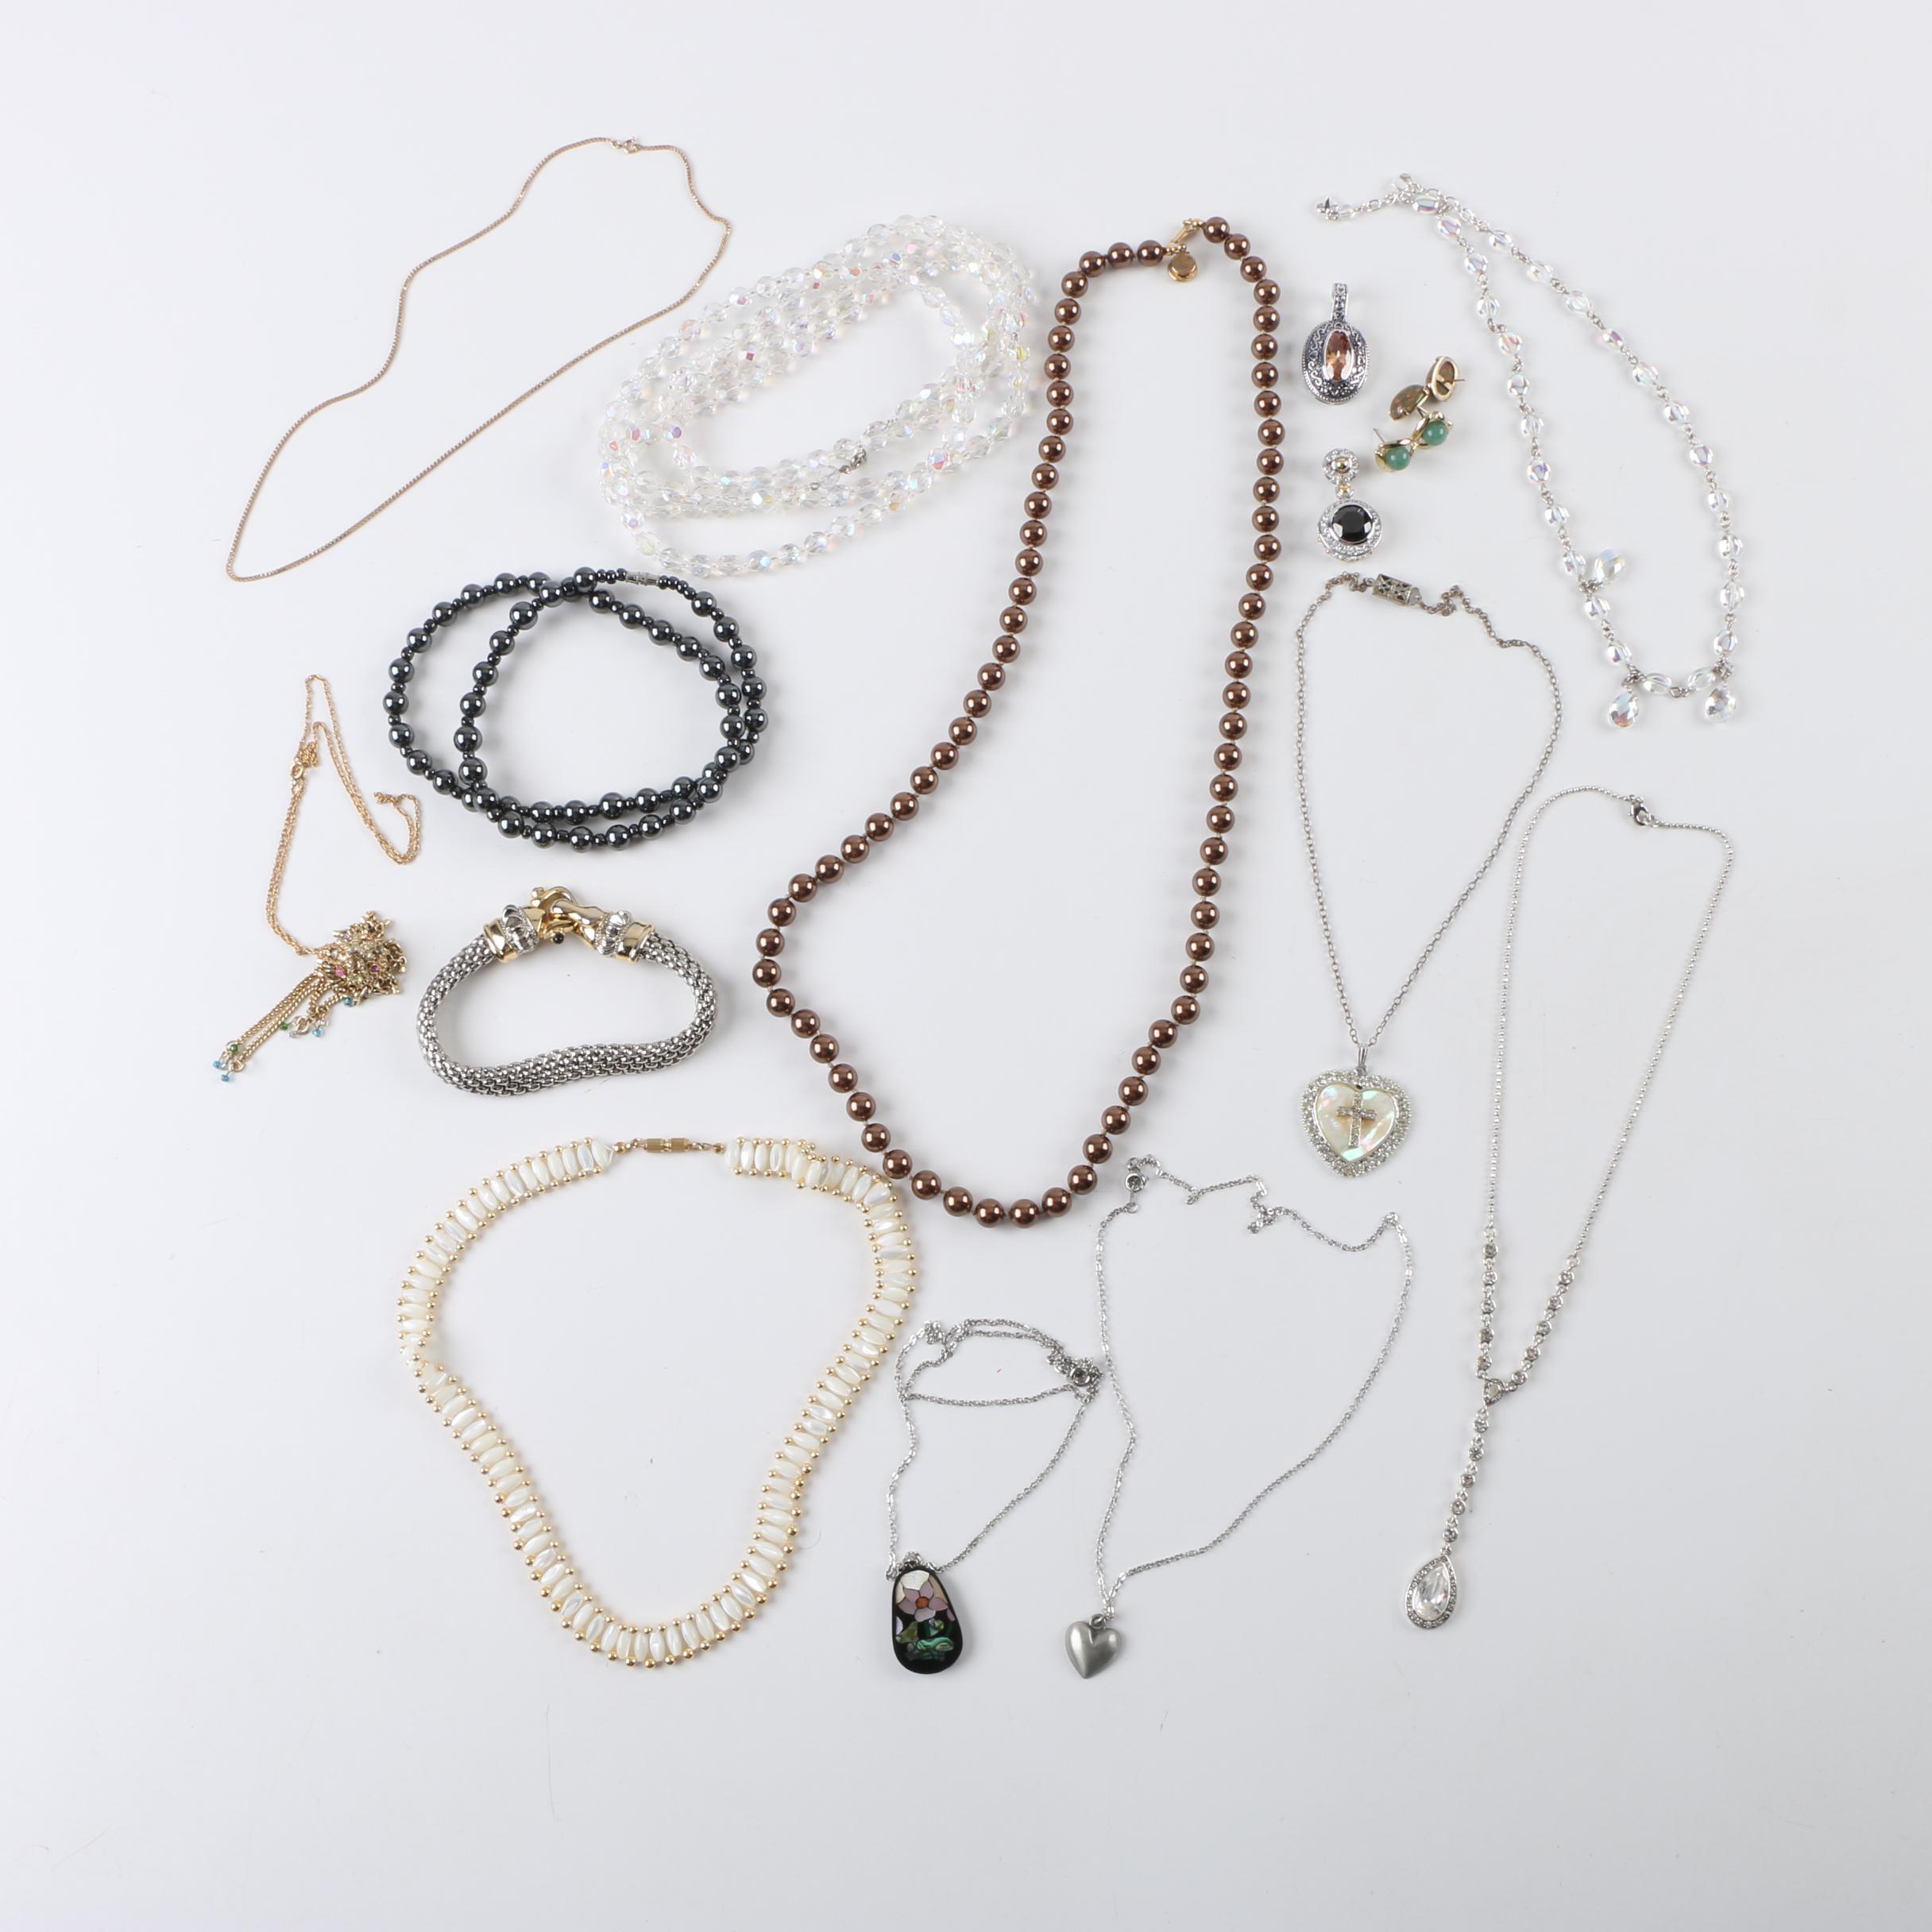 Gold-Tone Hematite, Unakite, Imitation Pearl, and Cubic Zirconia Jewelry